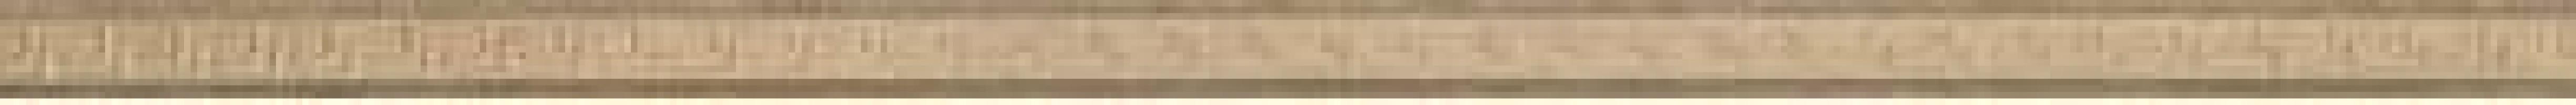 Бордюр Versace Vanitas Matita Greca Oro 39.4x1.5 37431